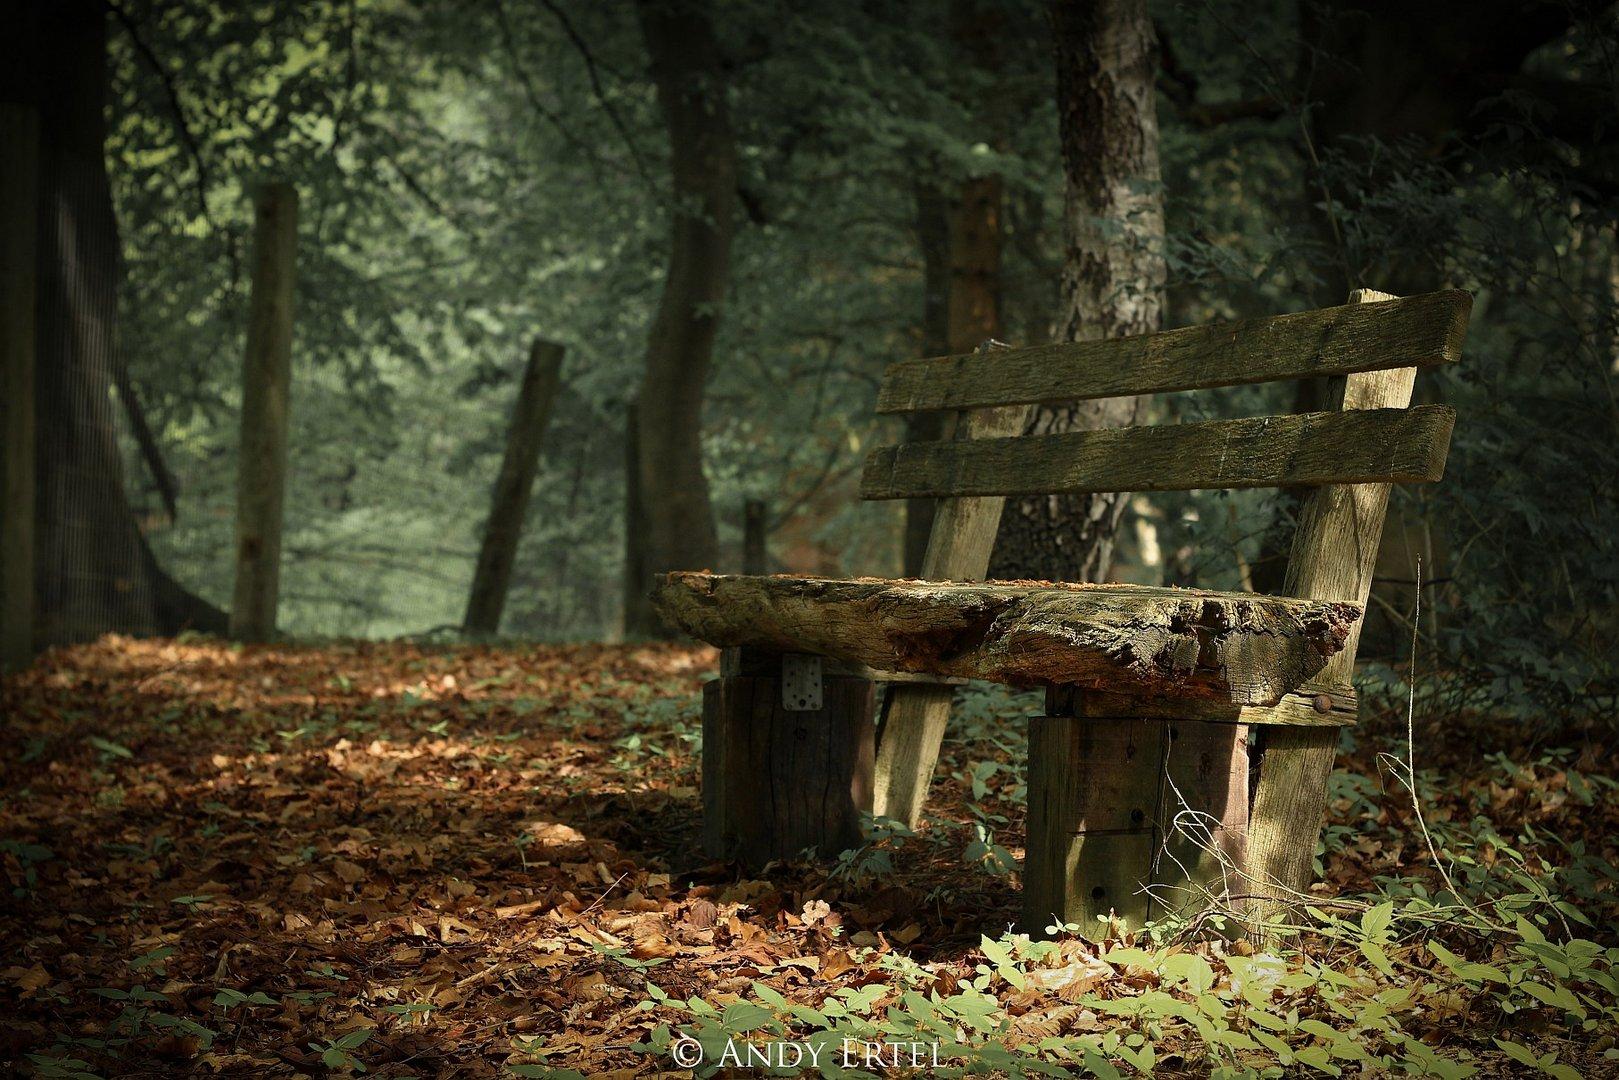 Ruhe - die Seele der Natur